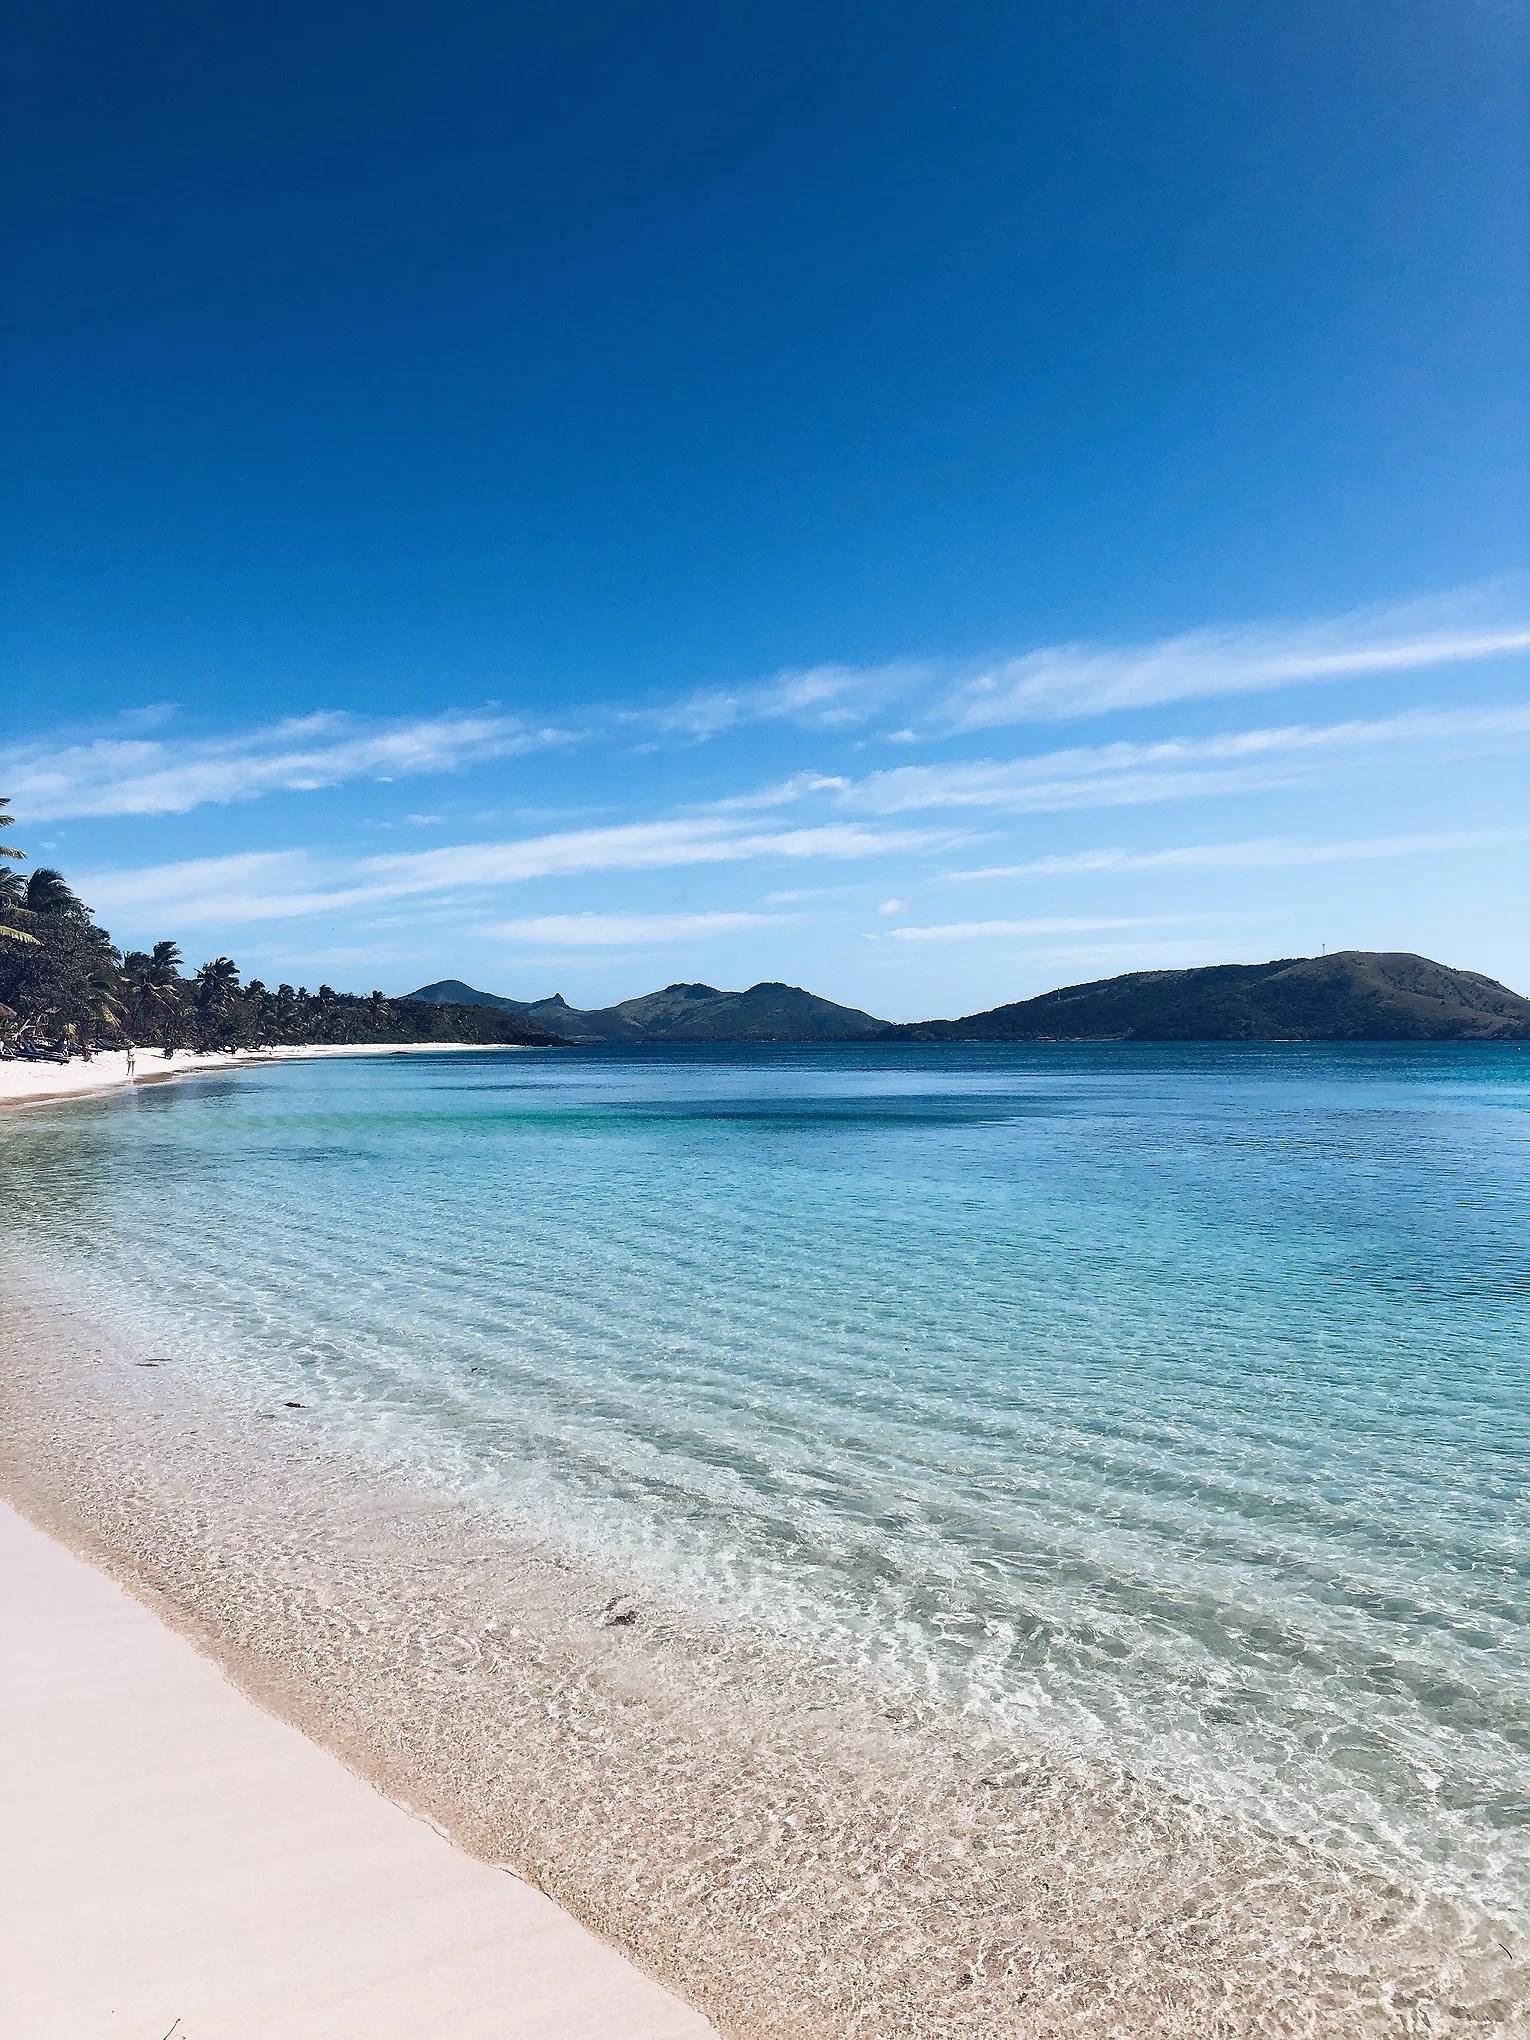 Fifth country - Fiji